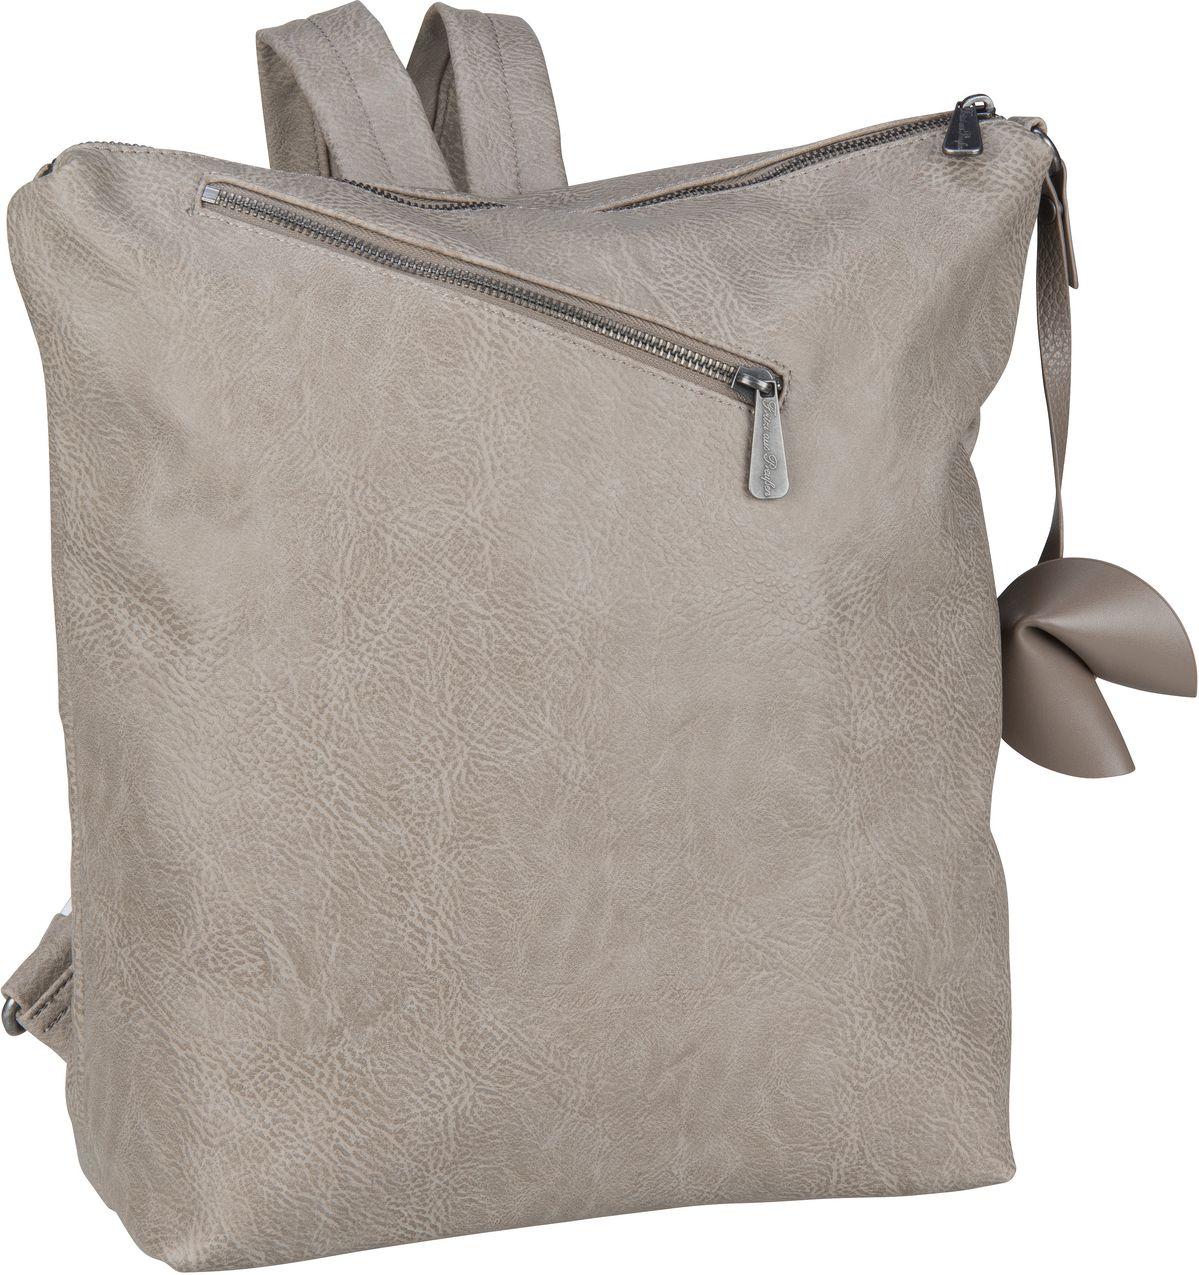 Rucksack / Daypack Andy Saddle Stone